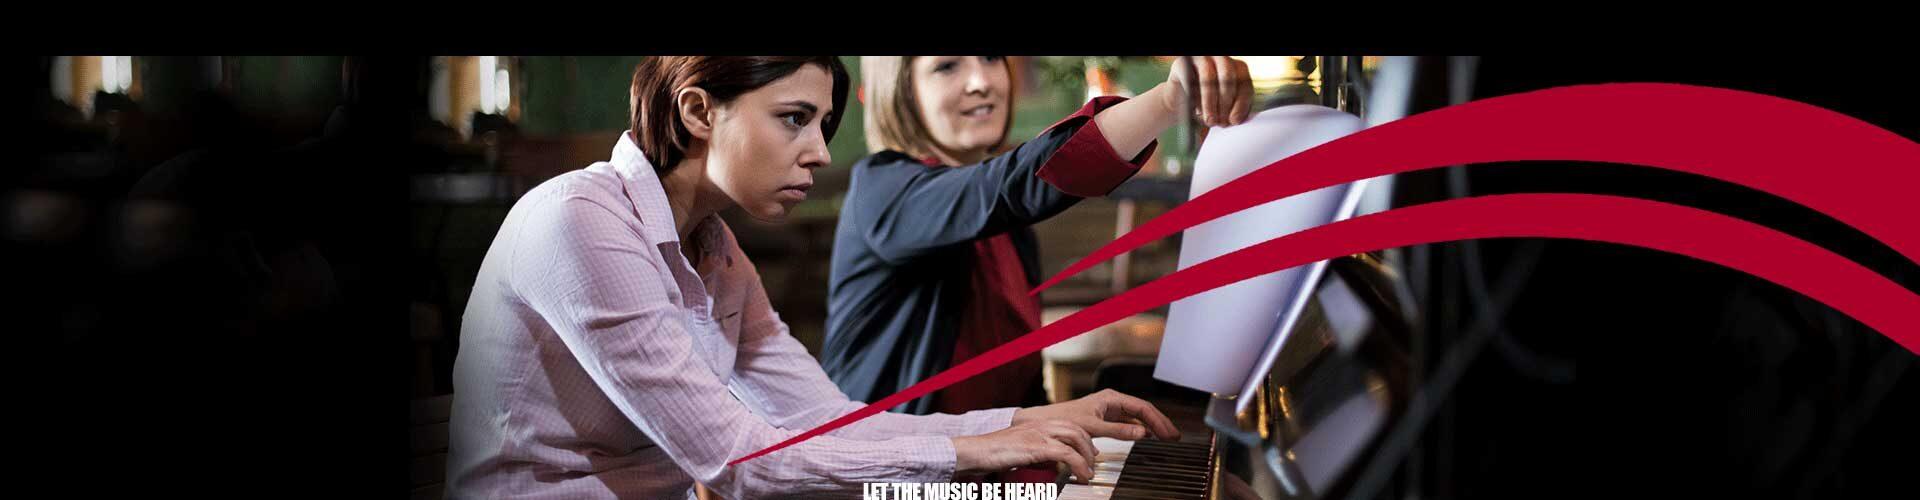 Trinity Music Certificate Exam in Abu Dhabi